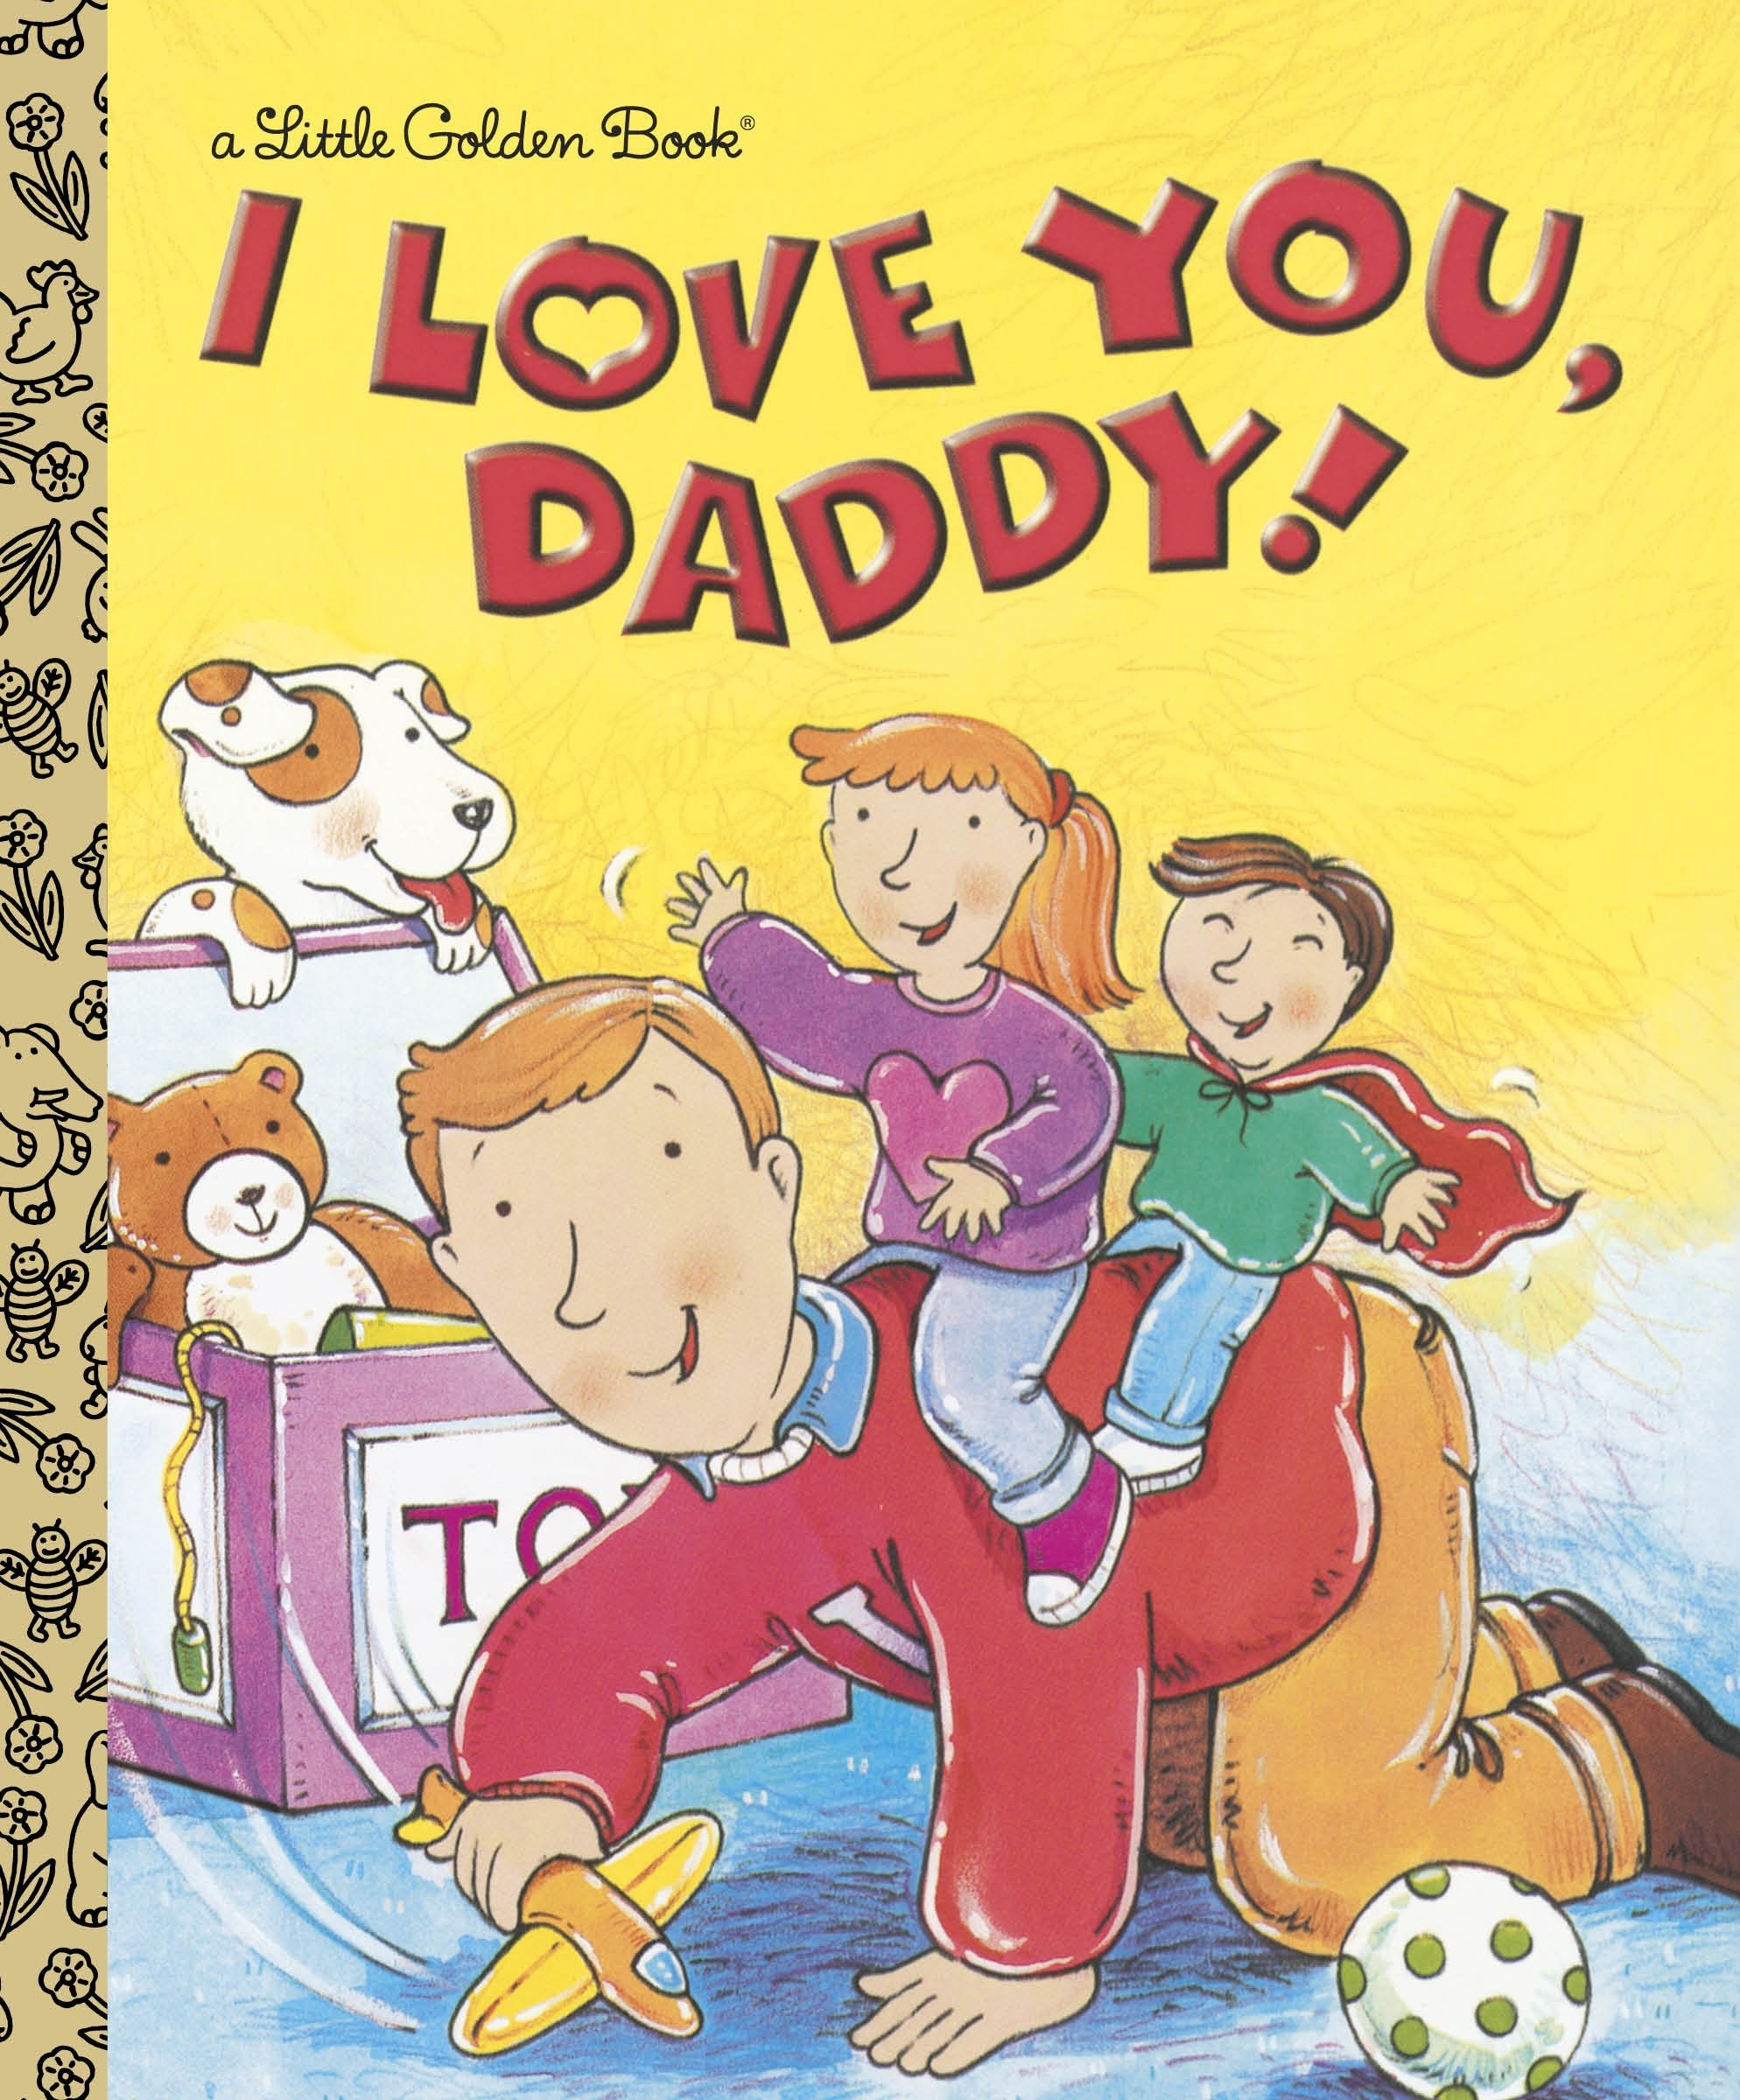 Amazon Com I Love You Daddy Little Golden Book 0033500995088 Evans Edie Fletcher Rusty Books